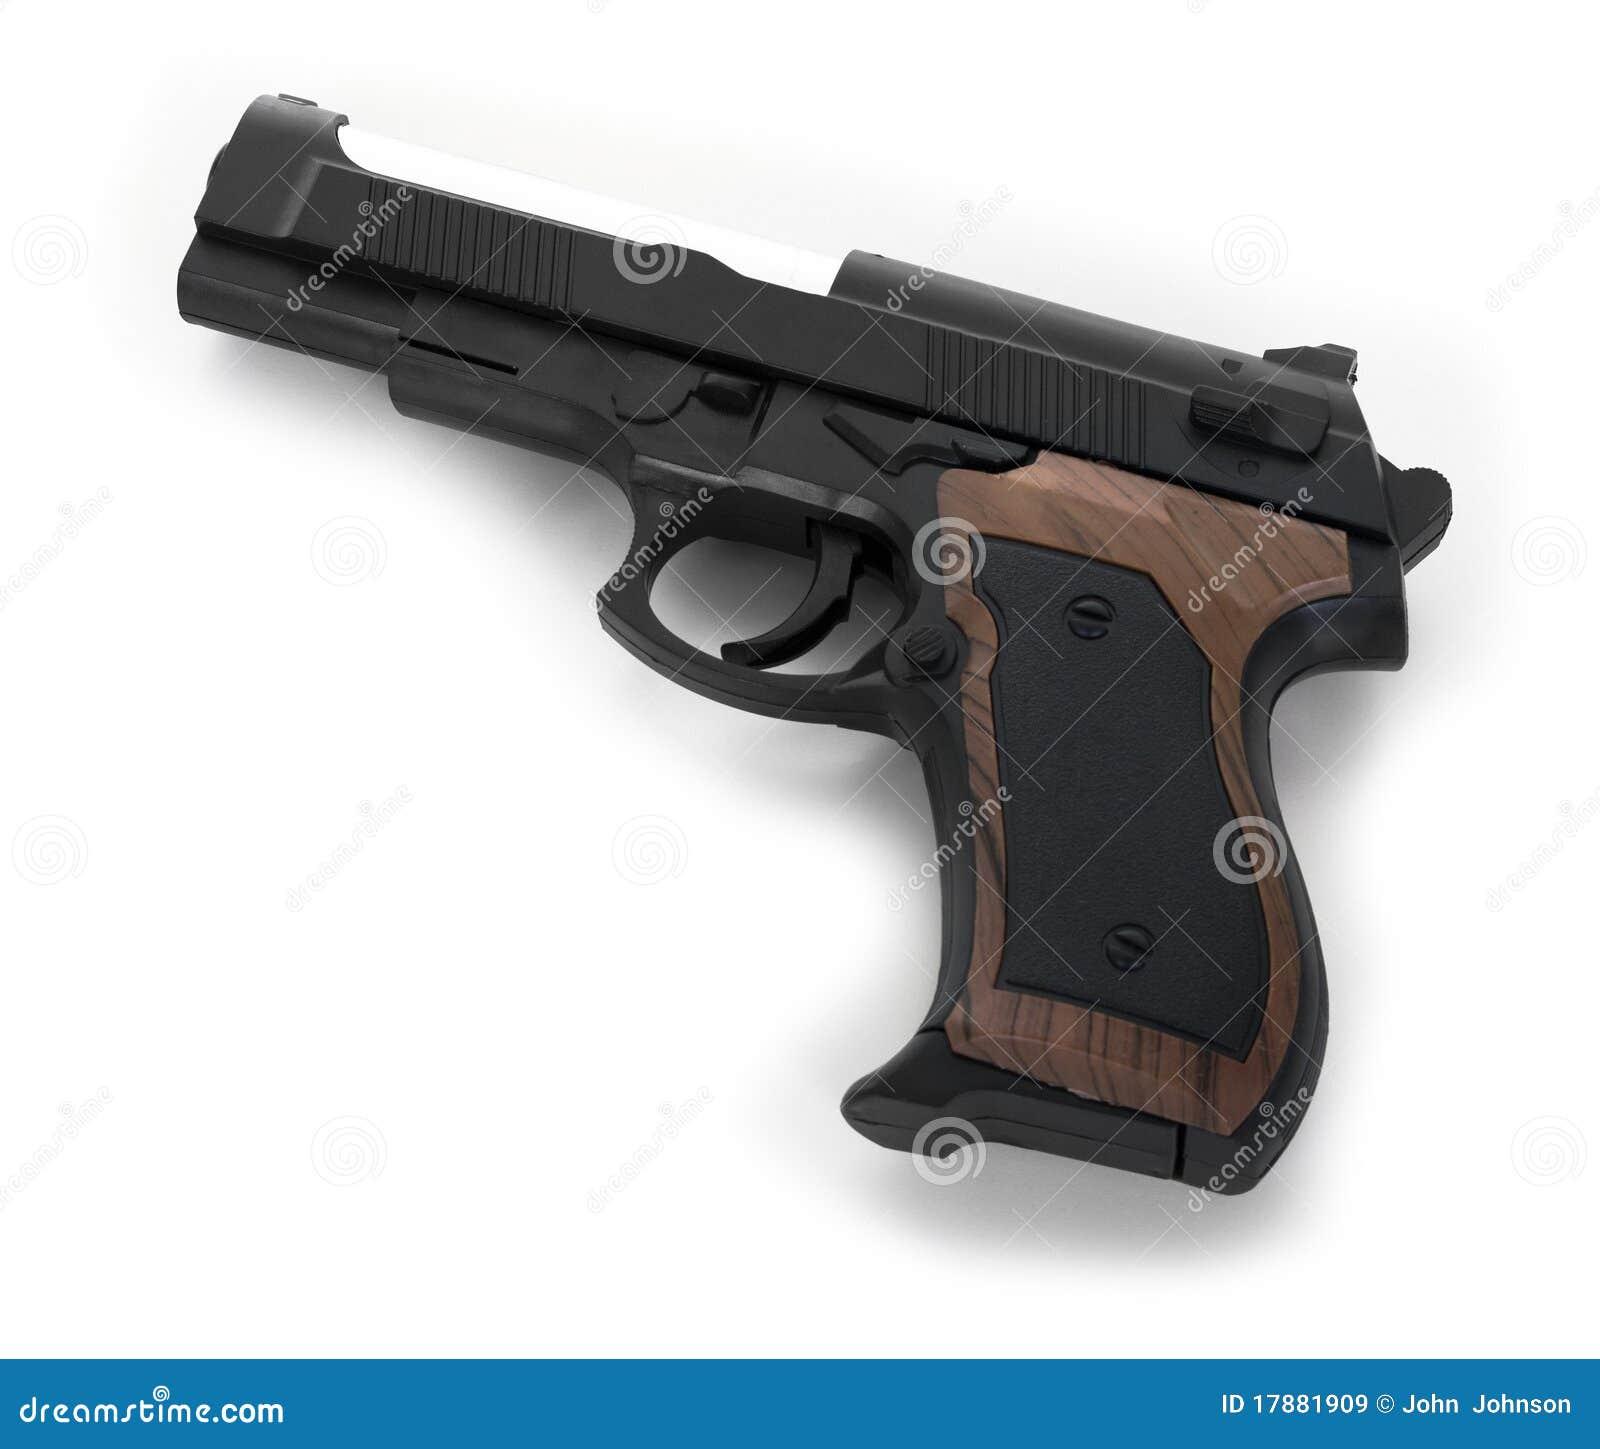 gun white background - photo #4